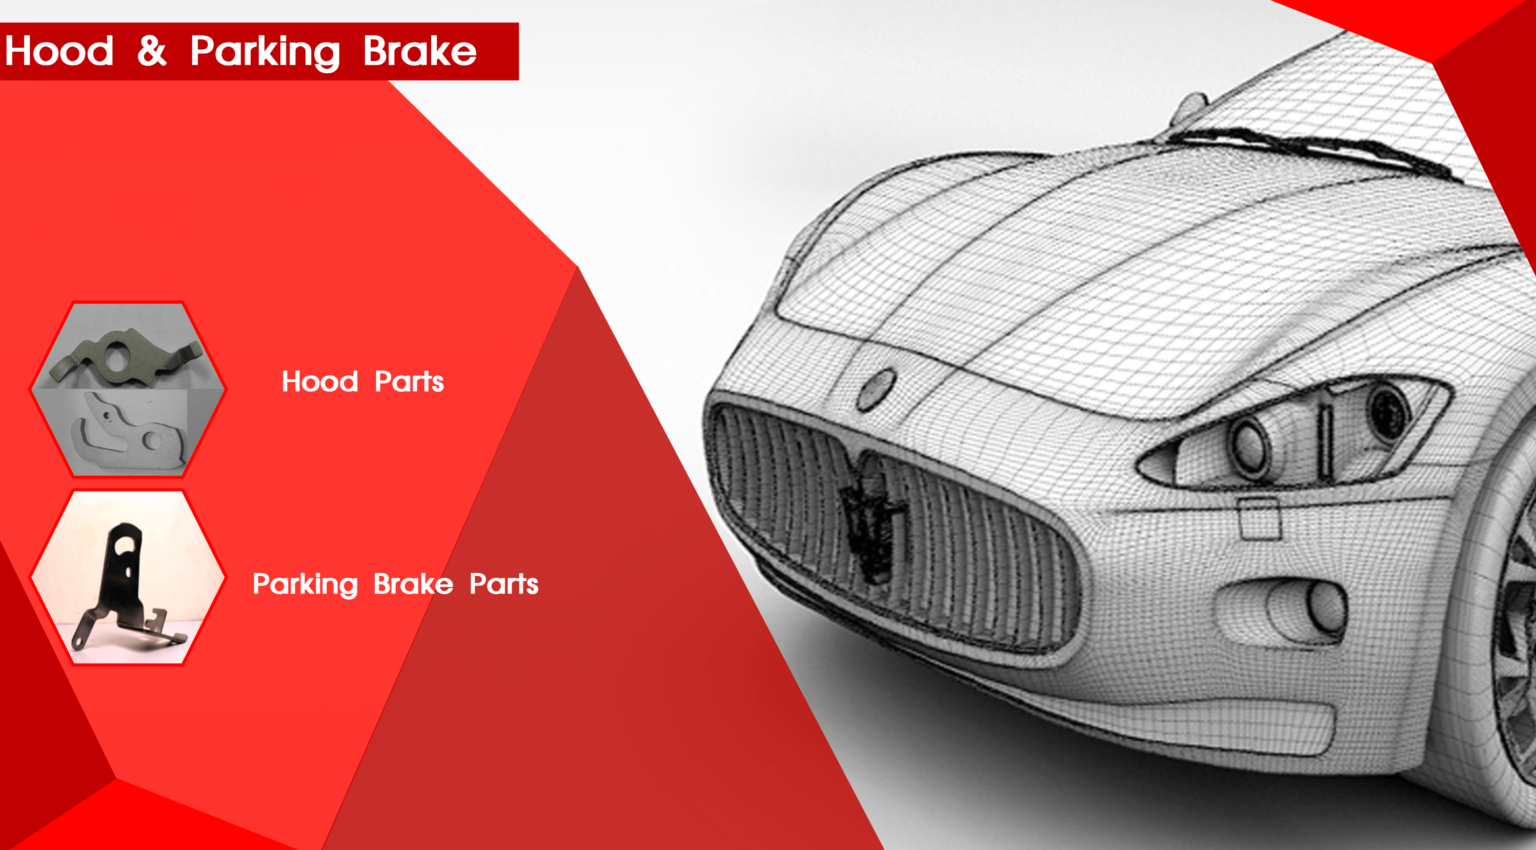 Hood and Parking Brake